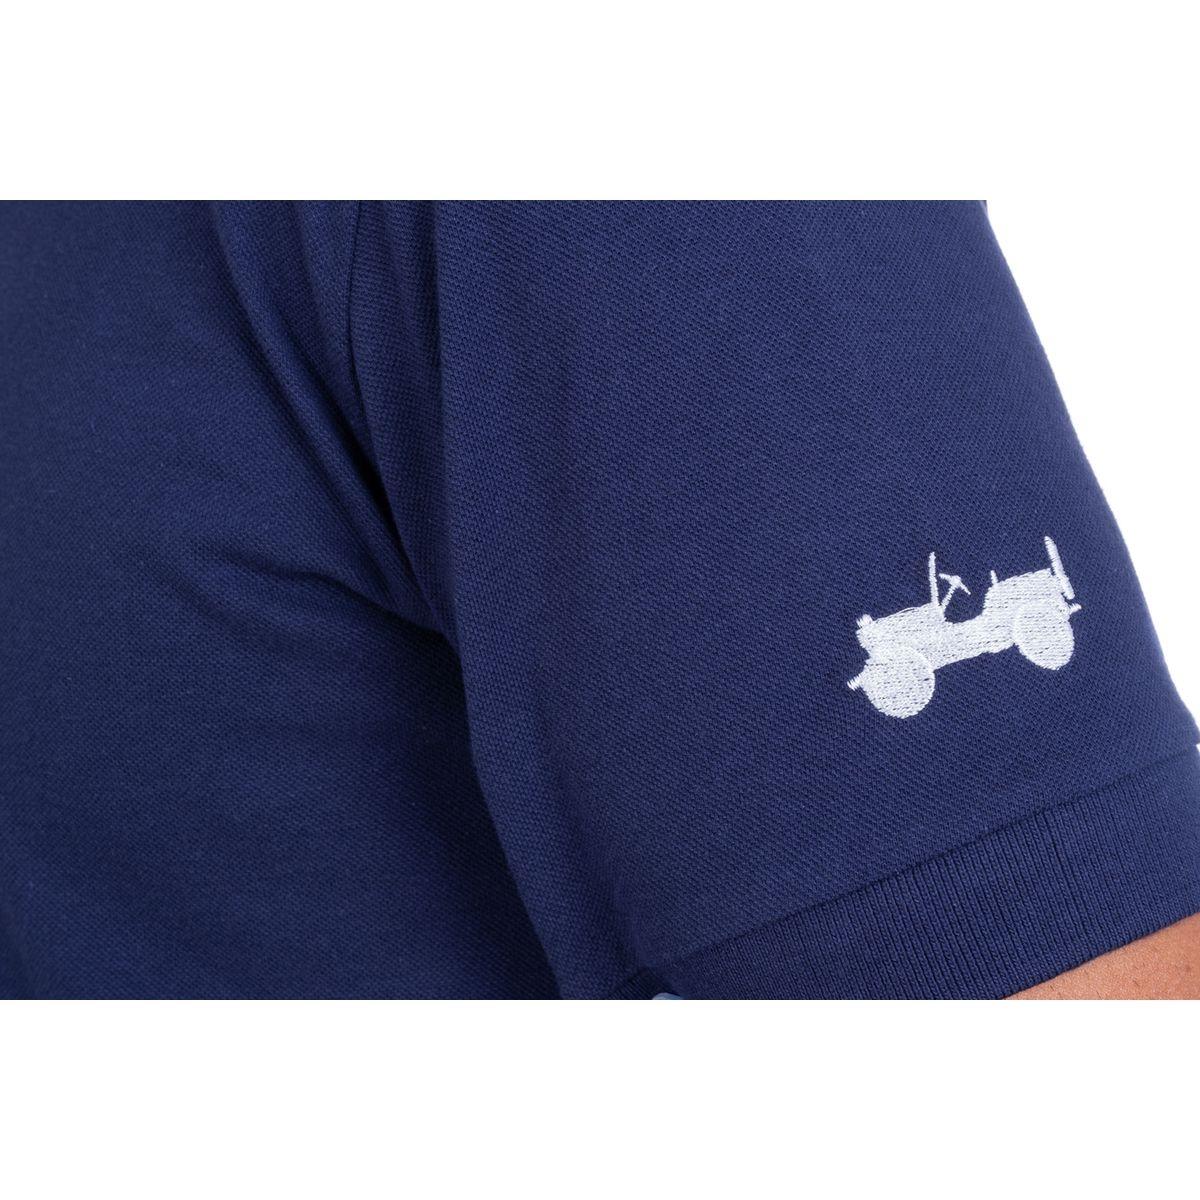 Polo avec broderie « willys de profil » j20s